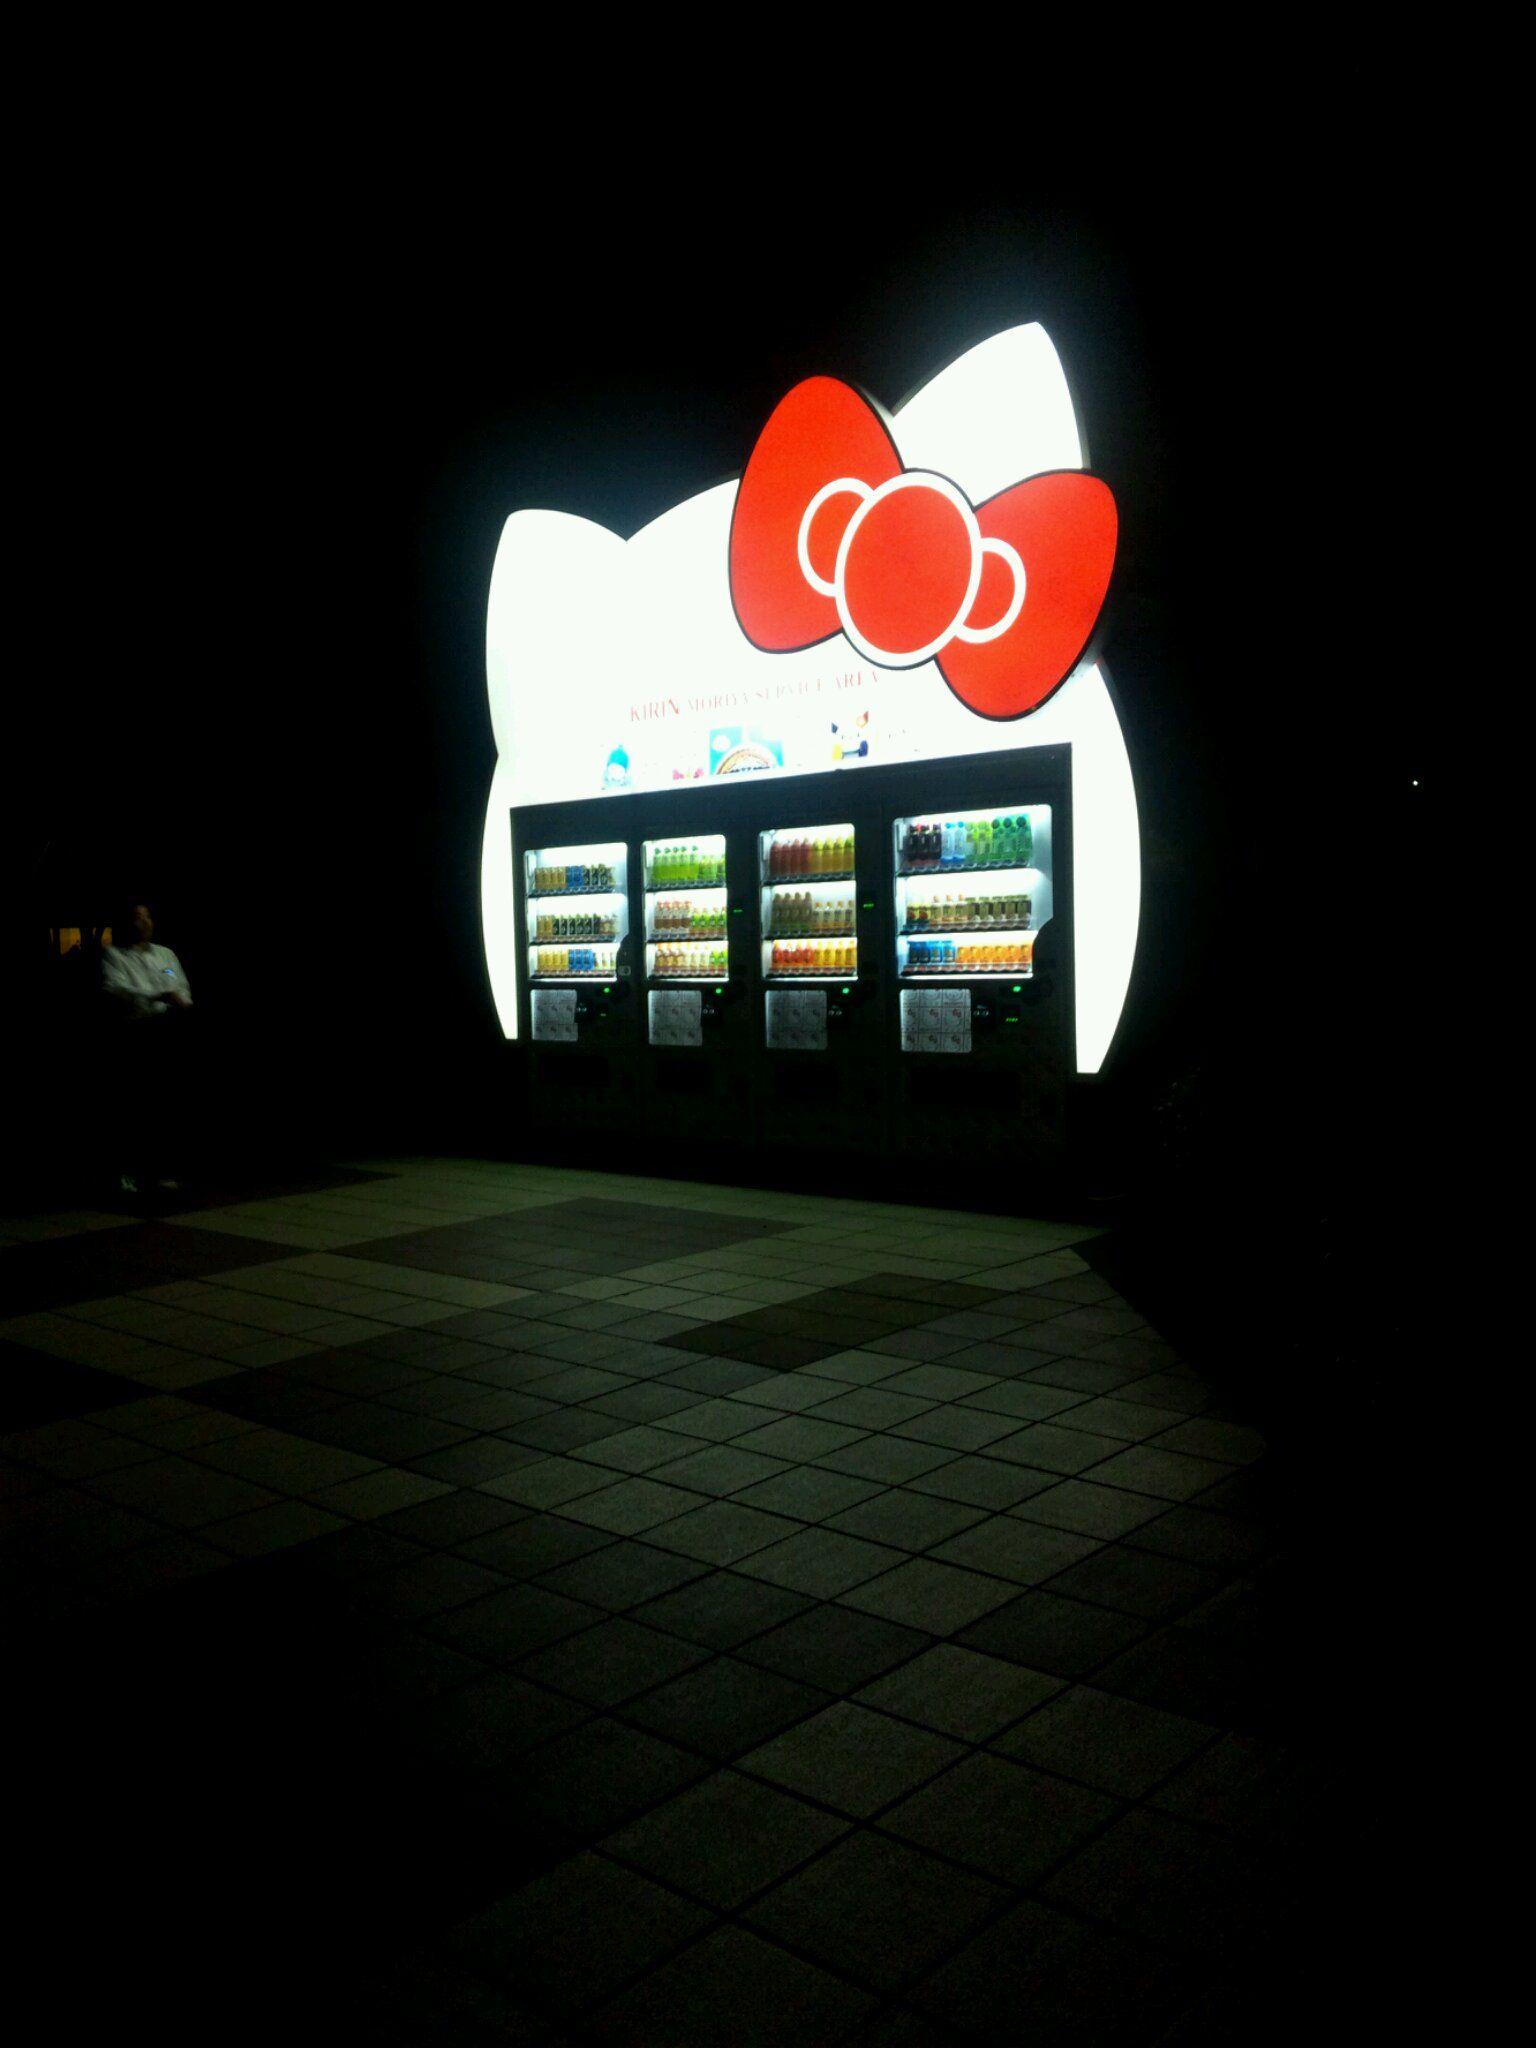 Amazing Night View... Beverage Vending Machine in Japan